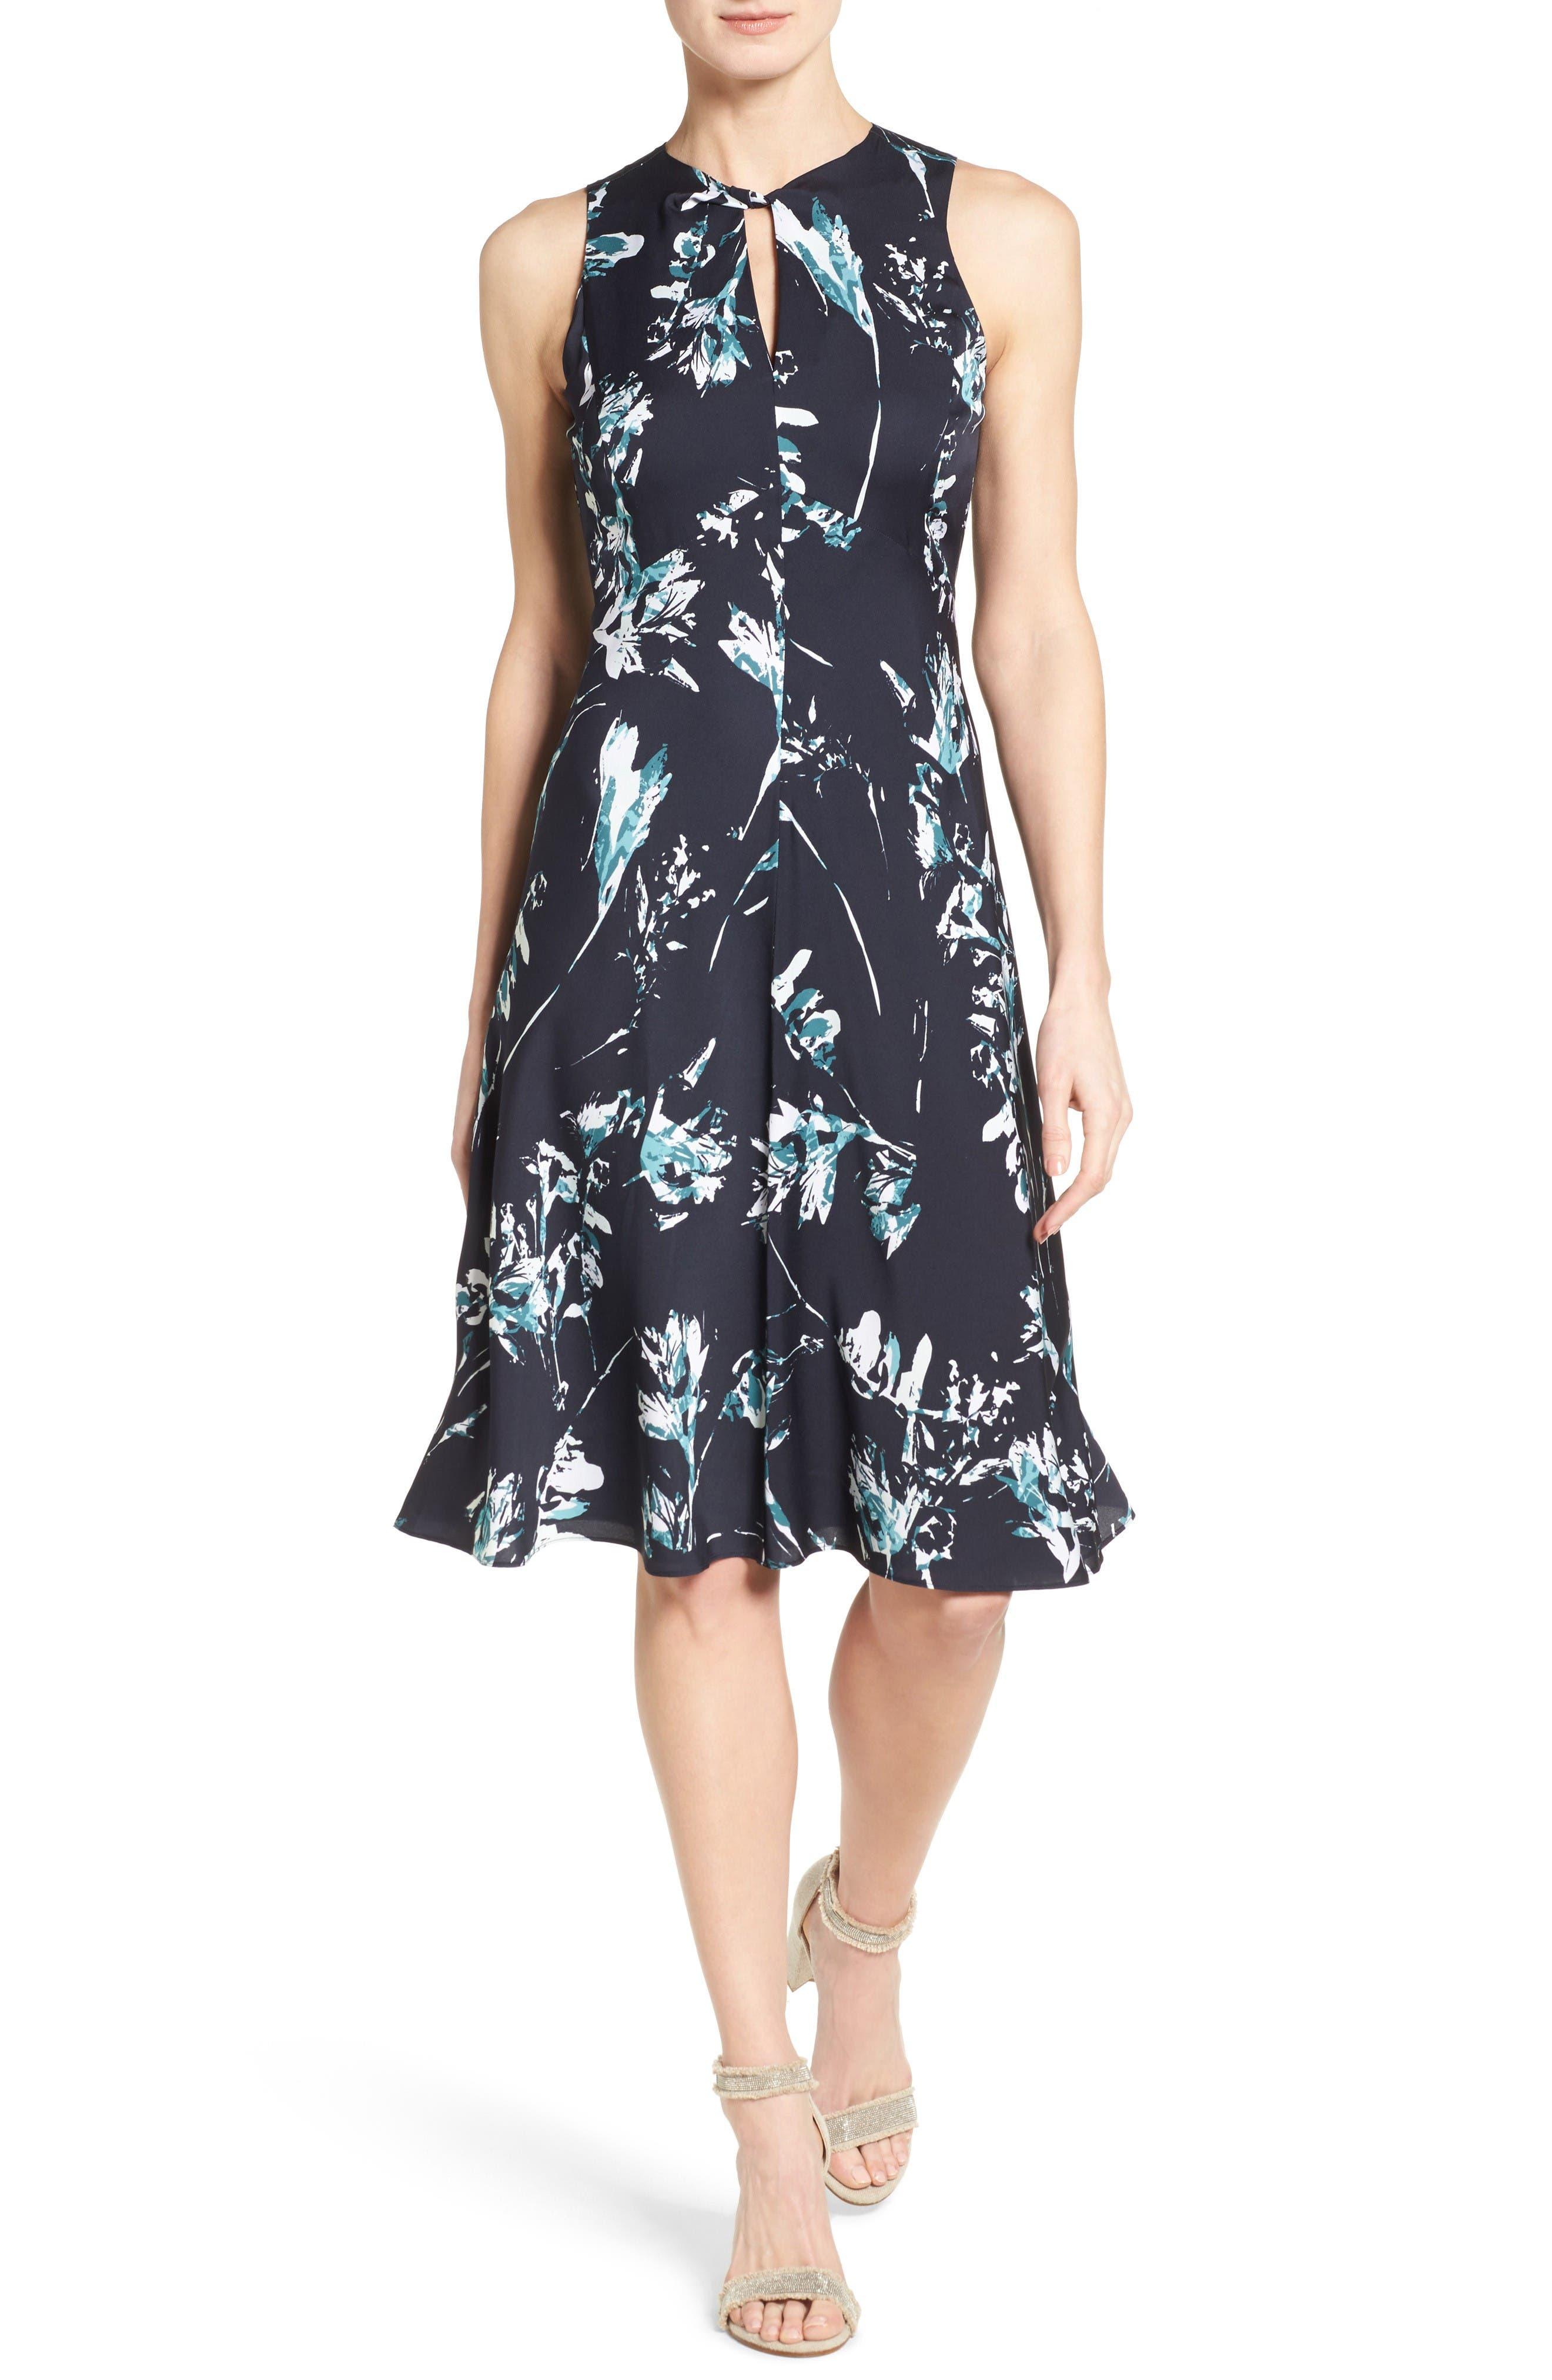 Alternate Image 1 Selected - Classiques Entier® Print Stretch Silk Twist Neck Dress